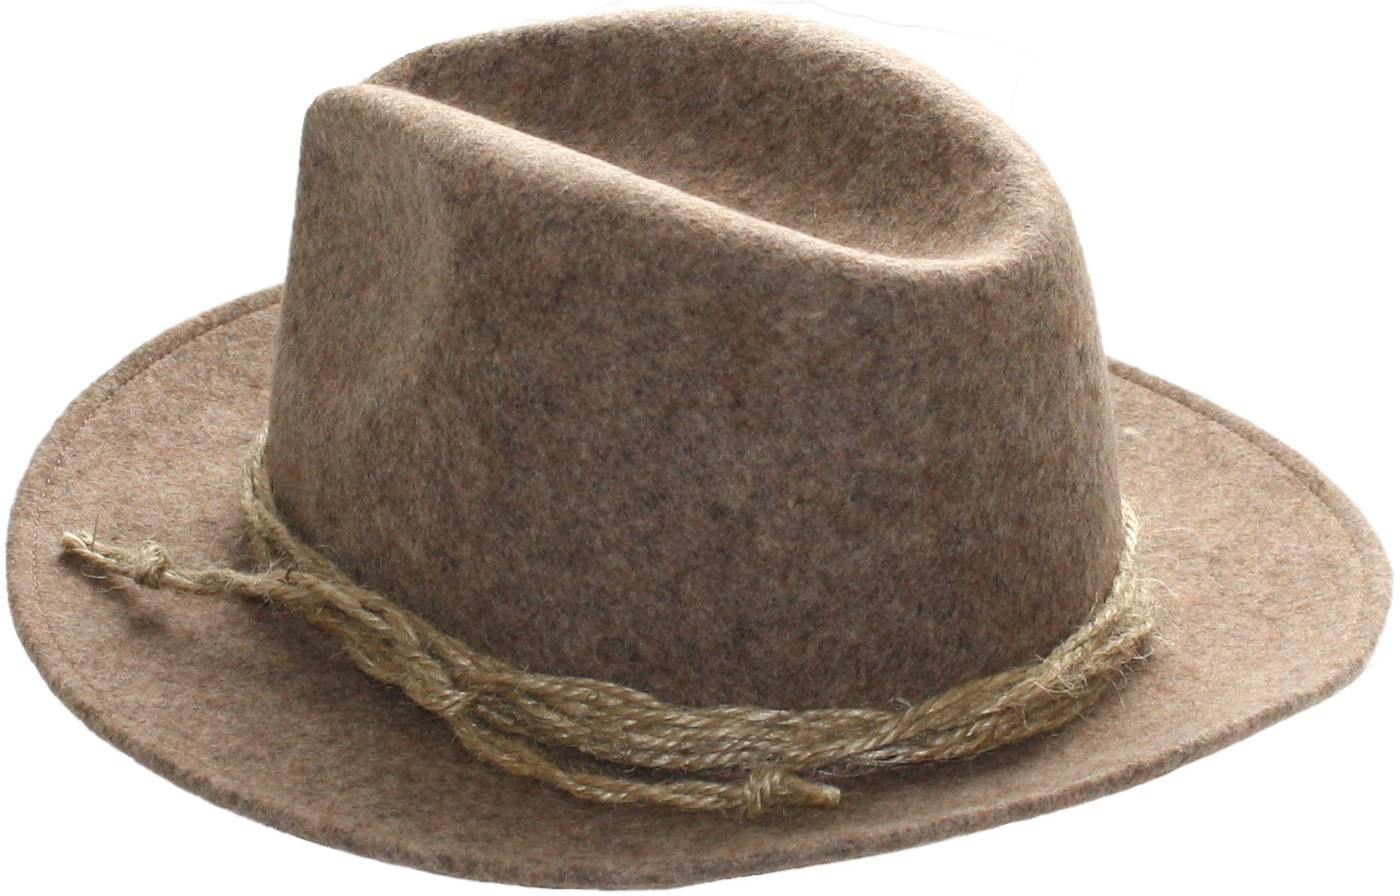 Bavarian hat ,Trachten hat,Color:Beige